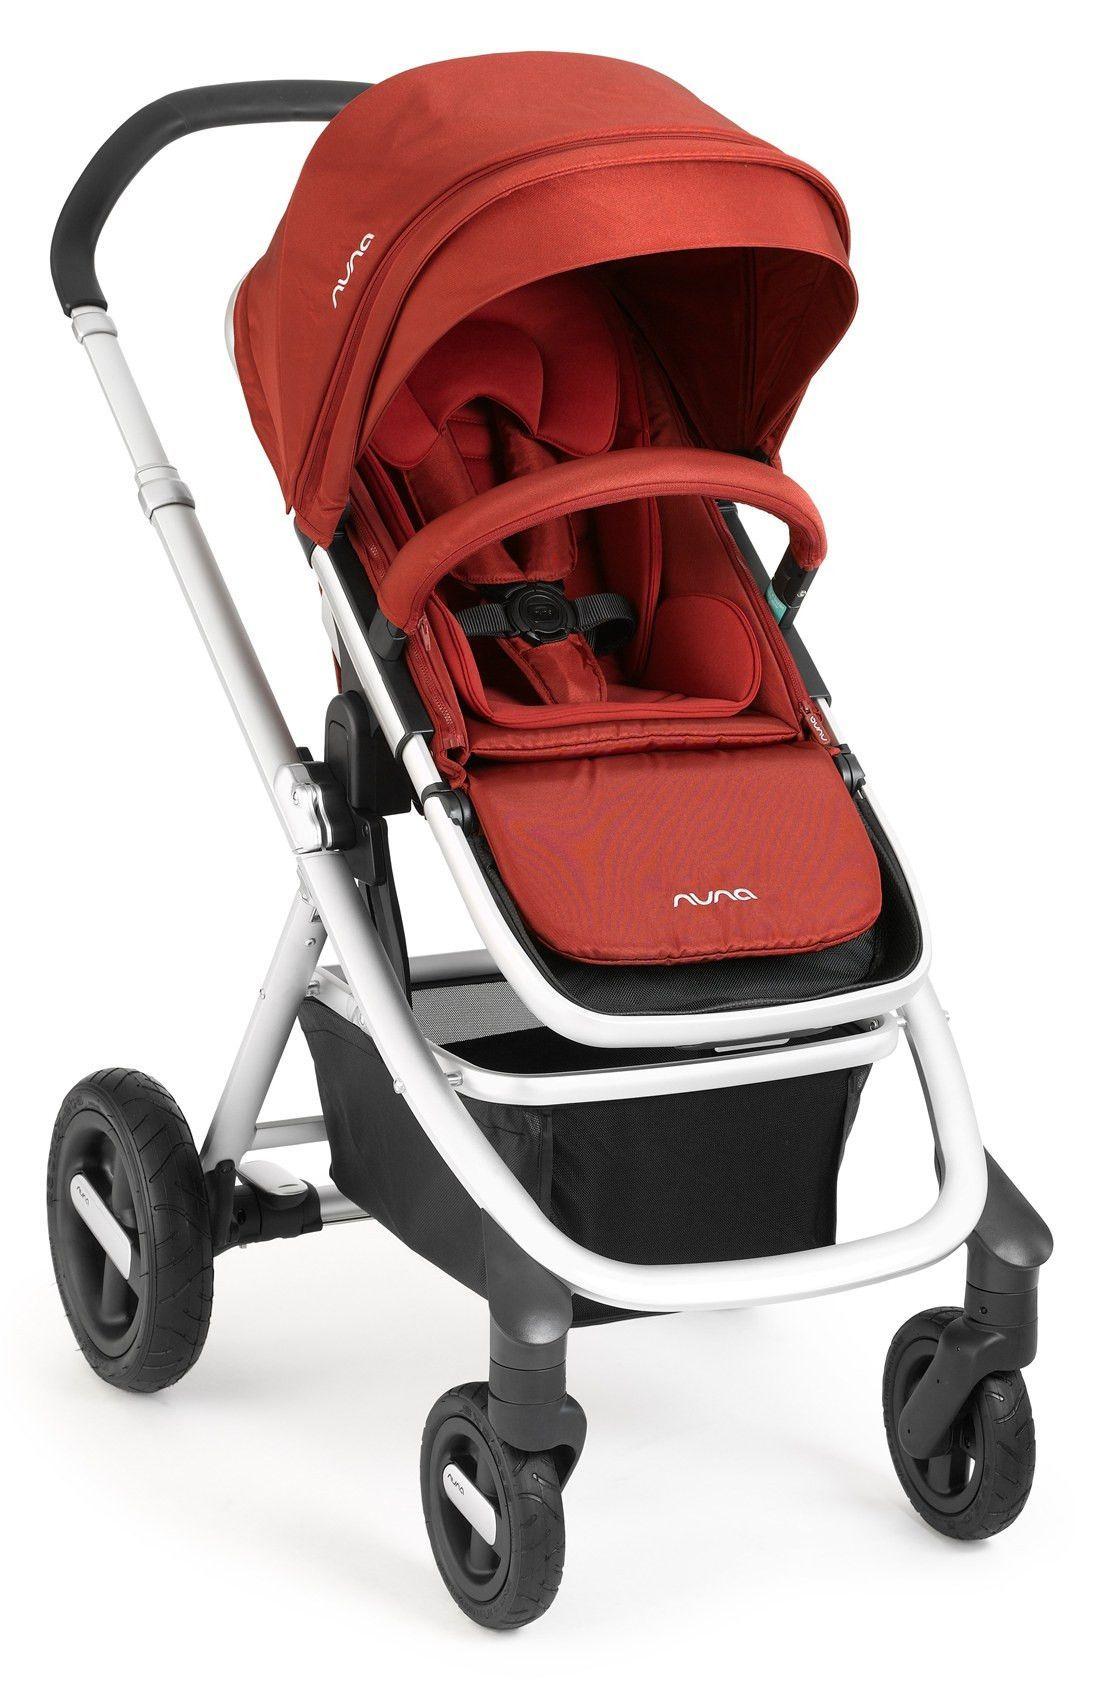 'IVVI™' Stroller Nuna ivvi stroller, Baby strollers